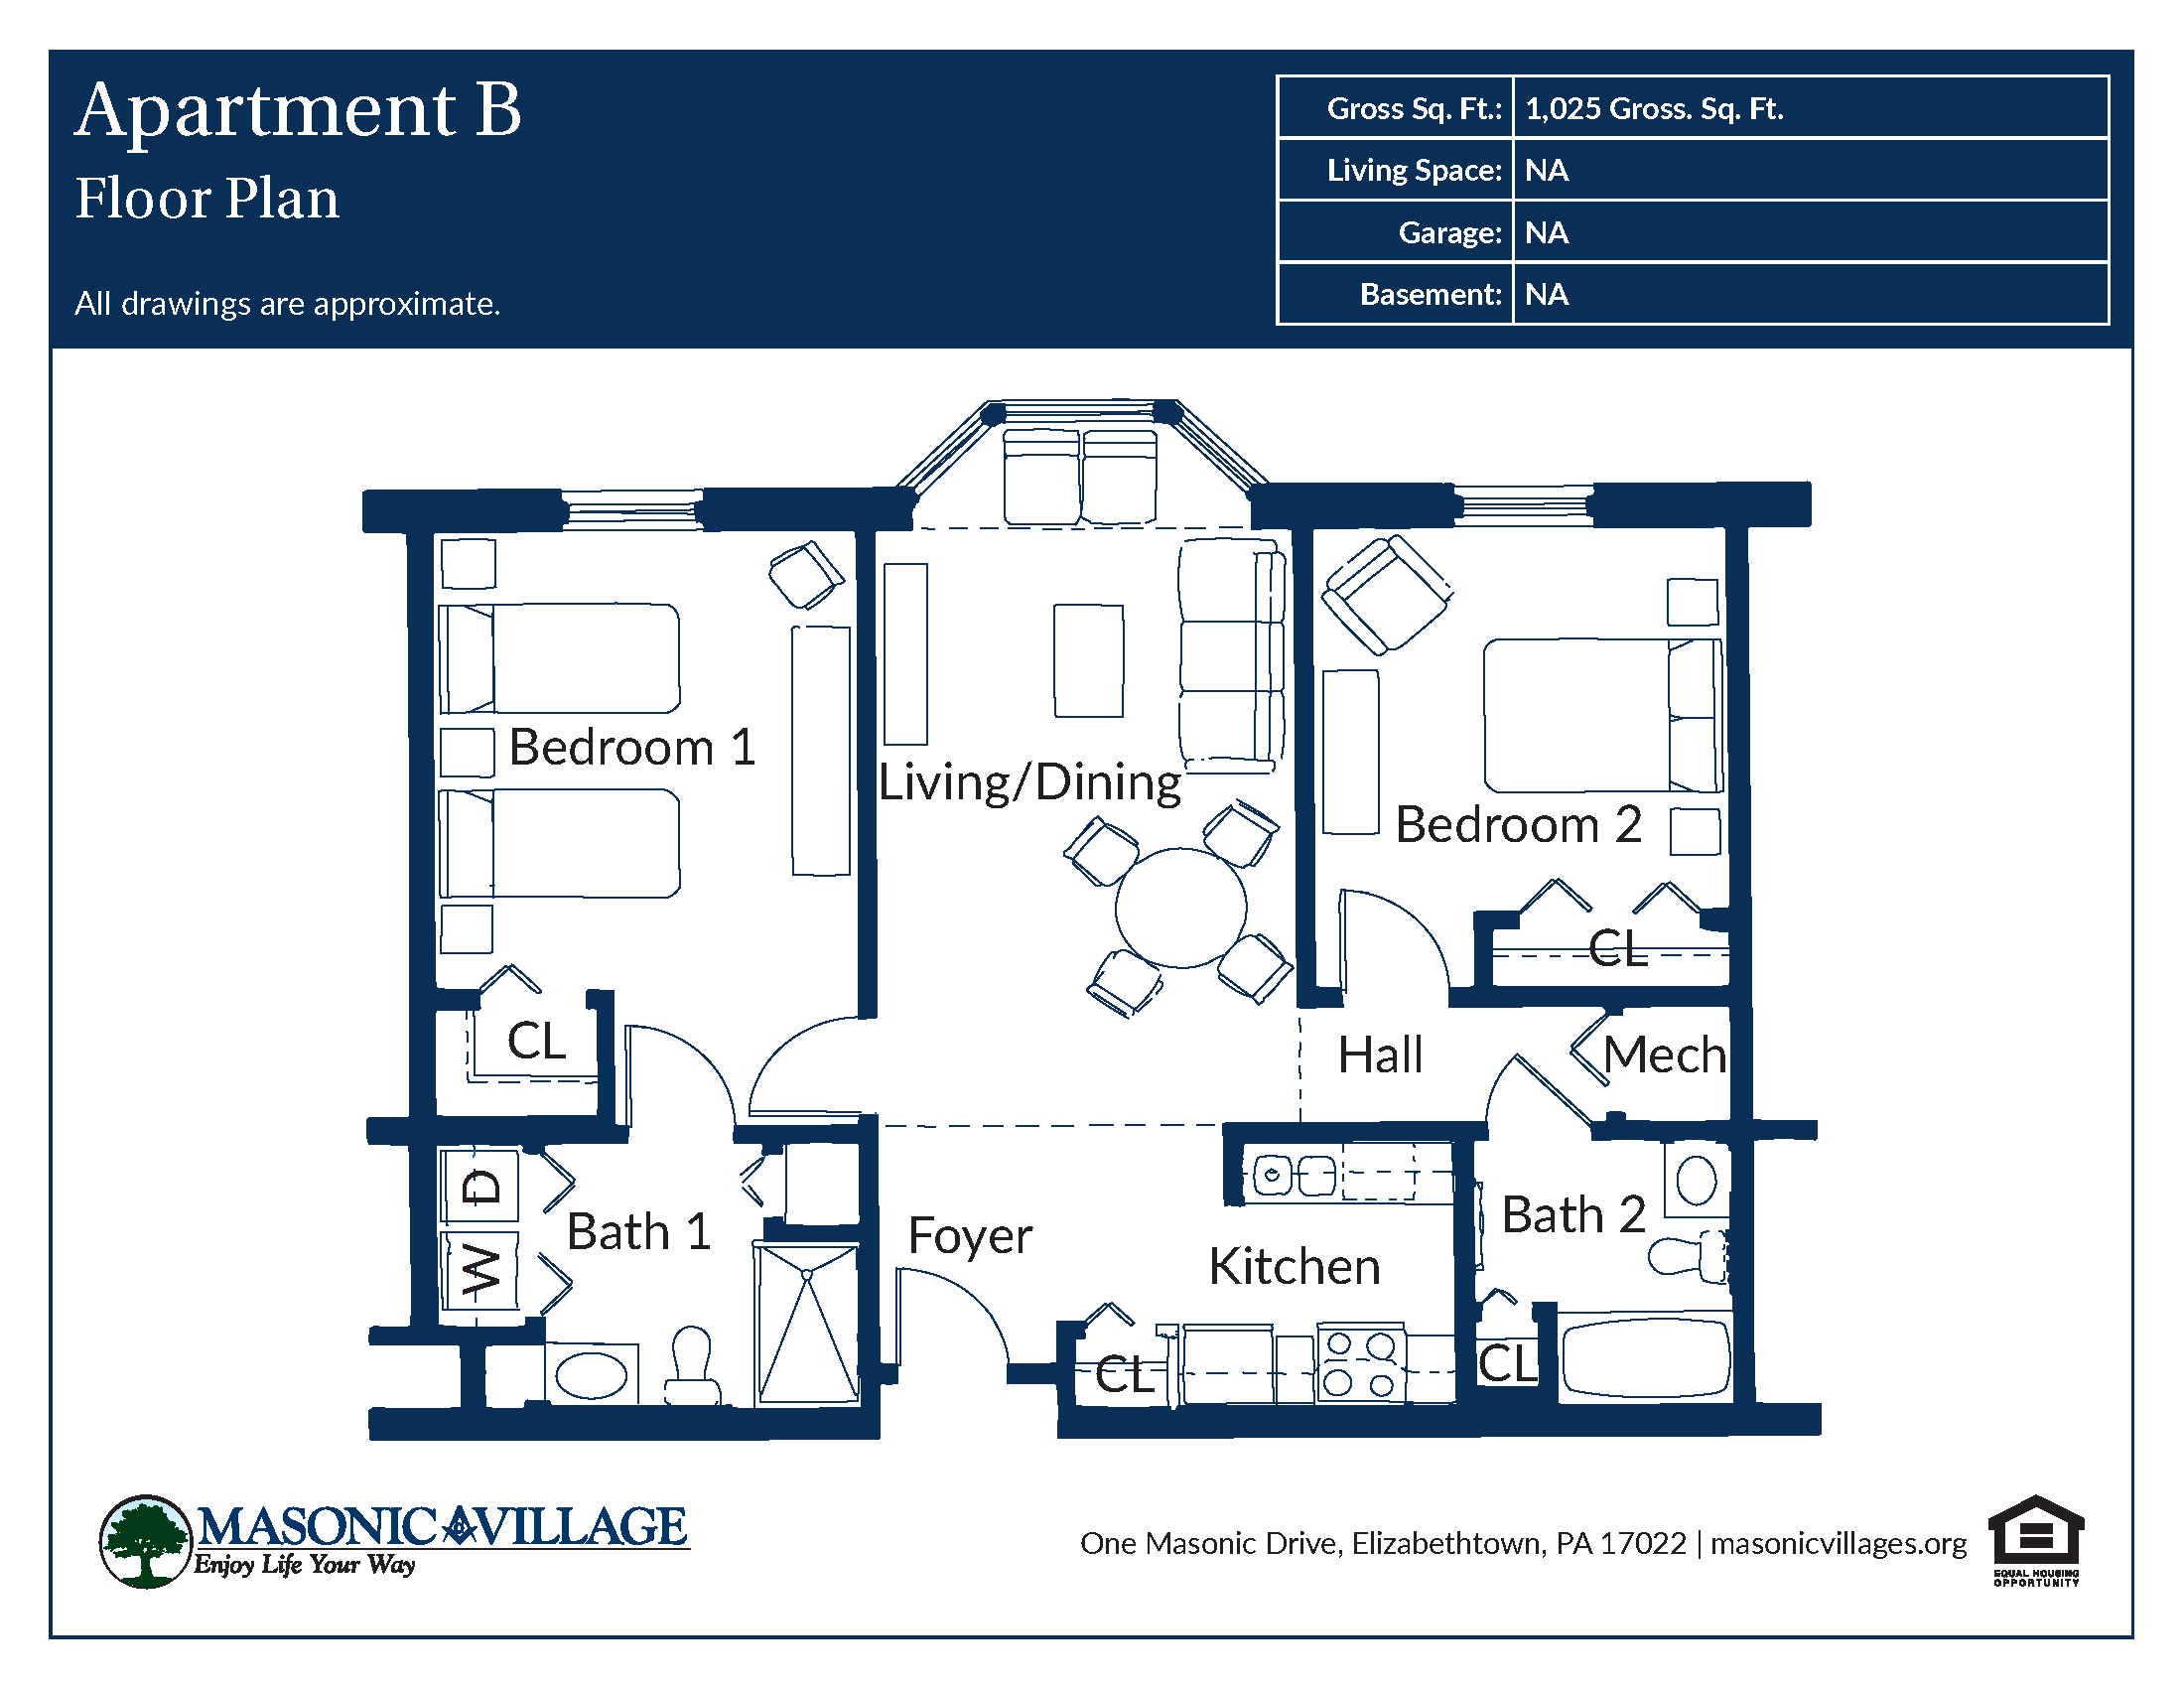 Masonic Village at Elizabethtown - Apartment B Floor Plan